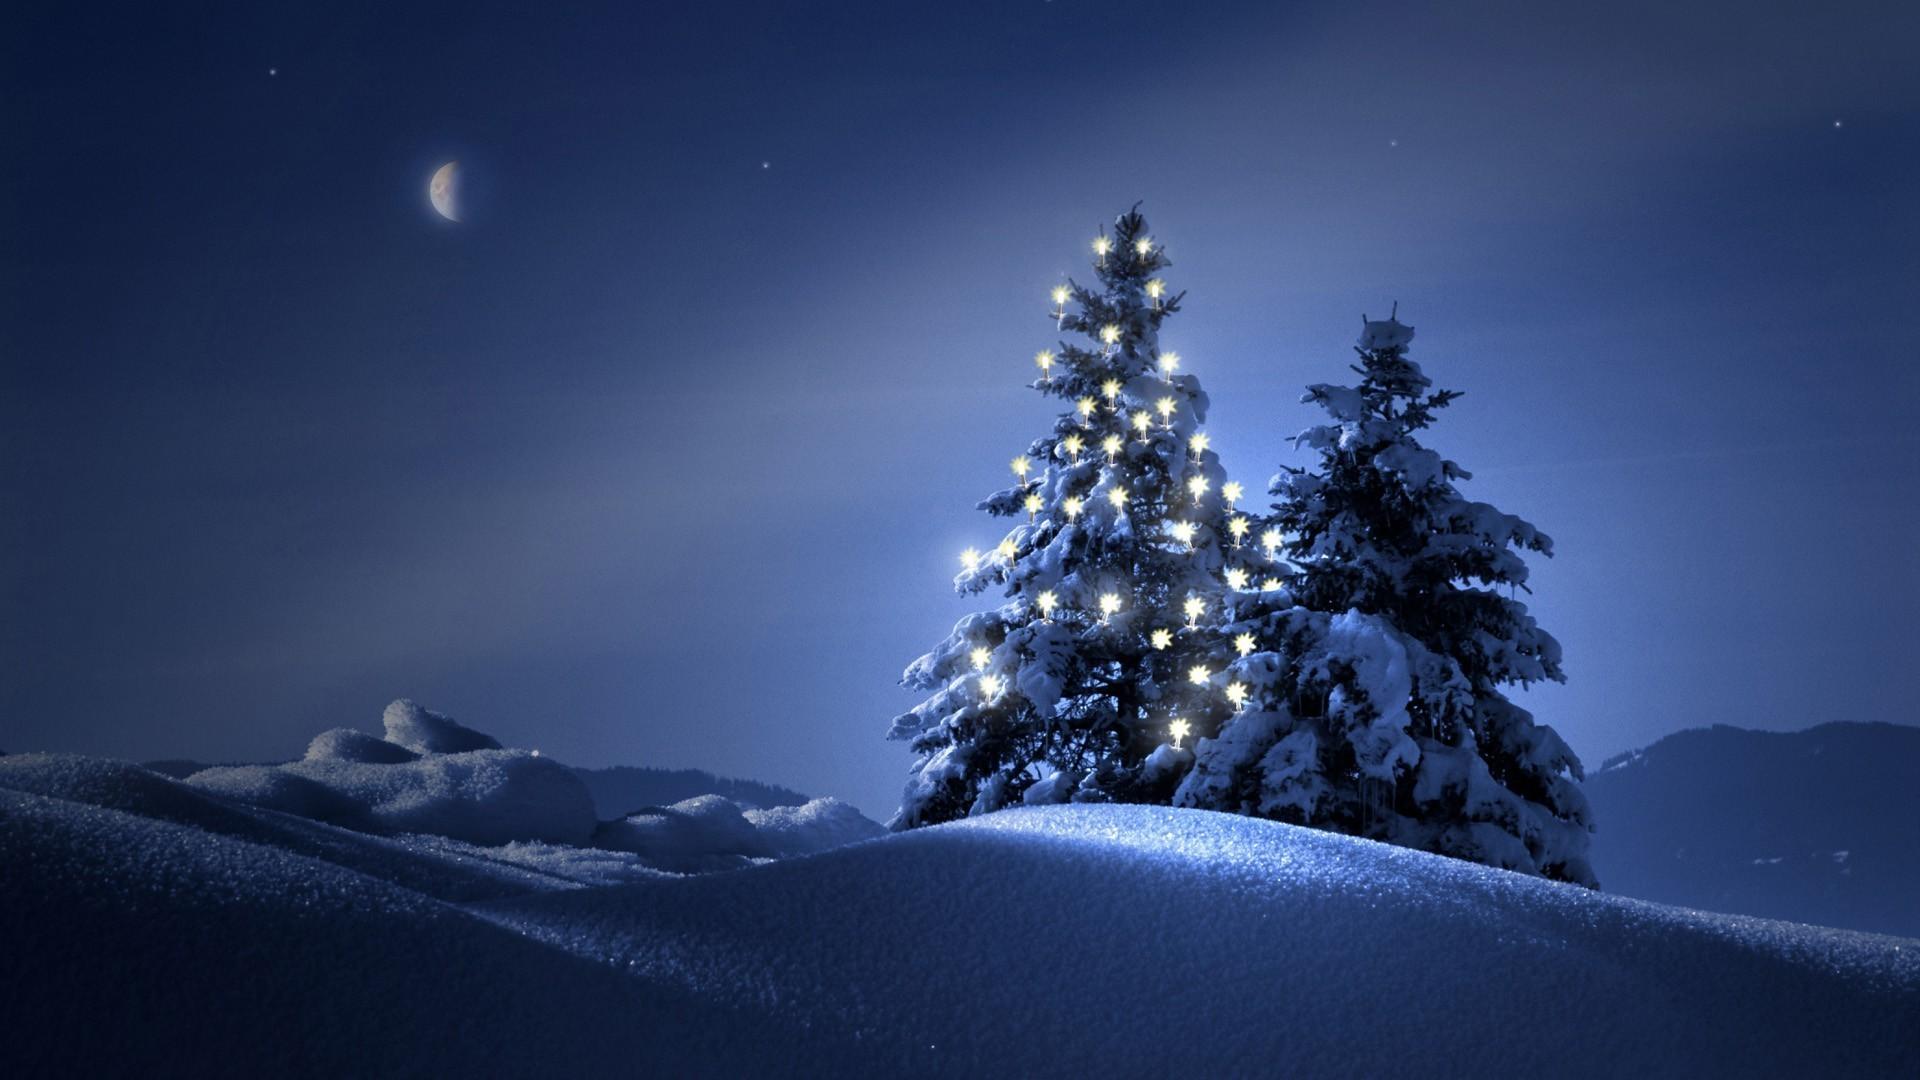 Snowy Christmas Tree Wallpaper (23)